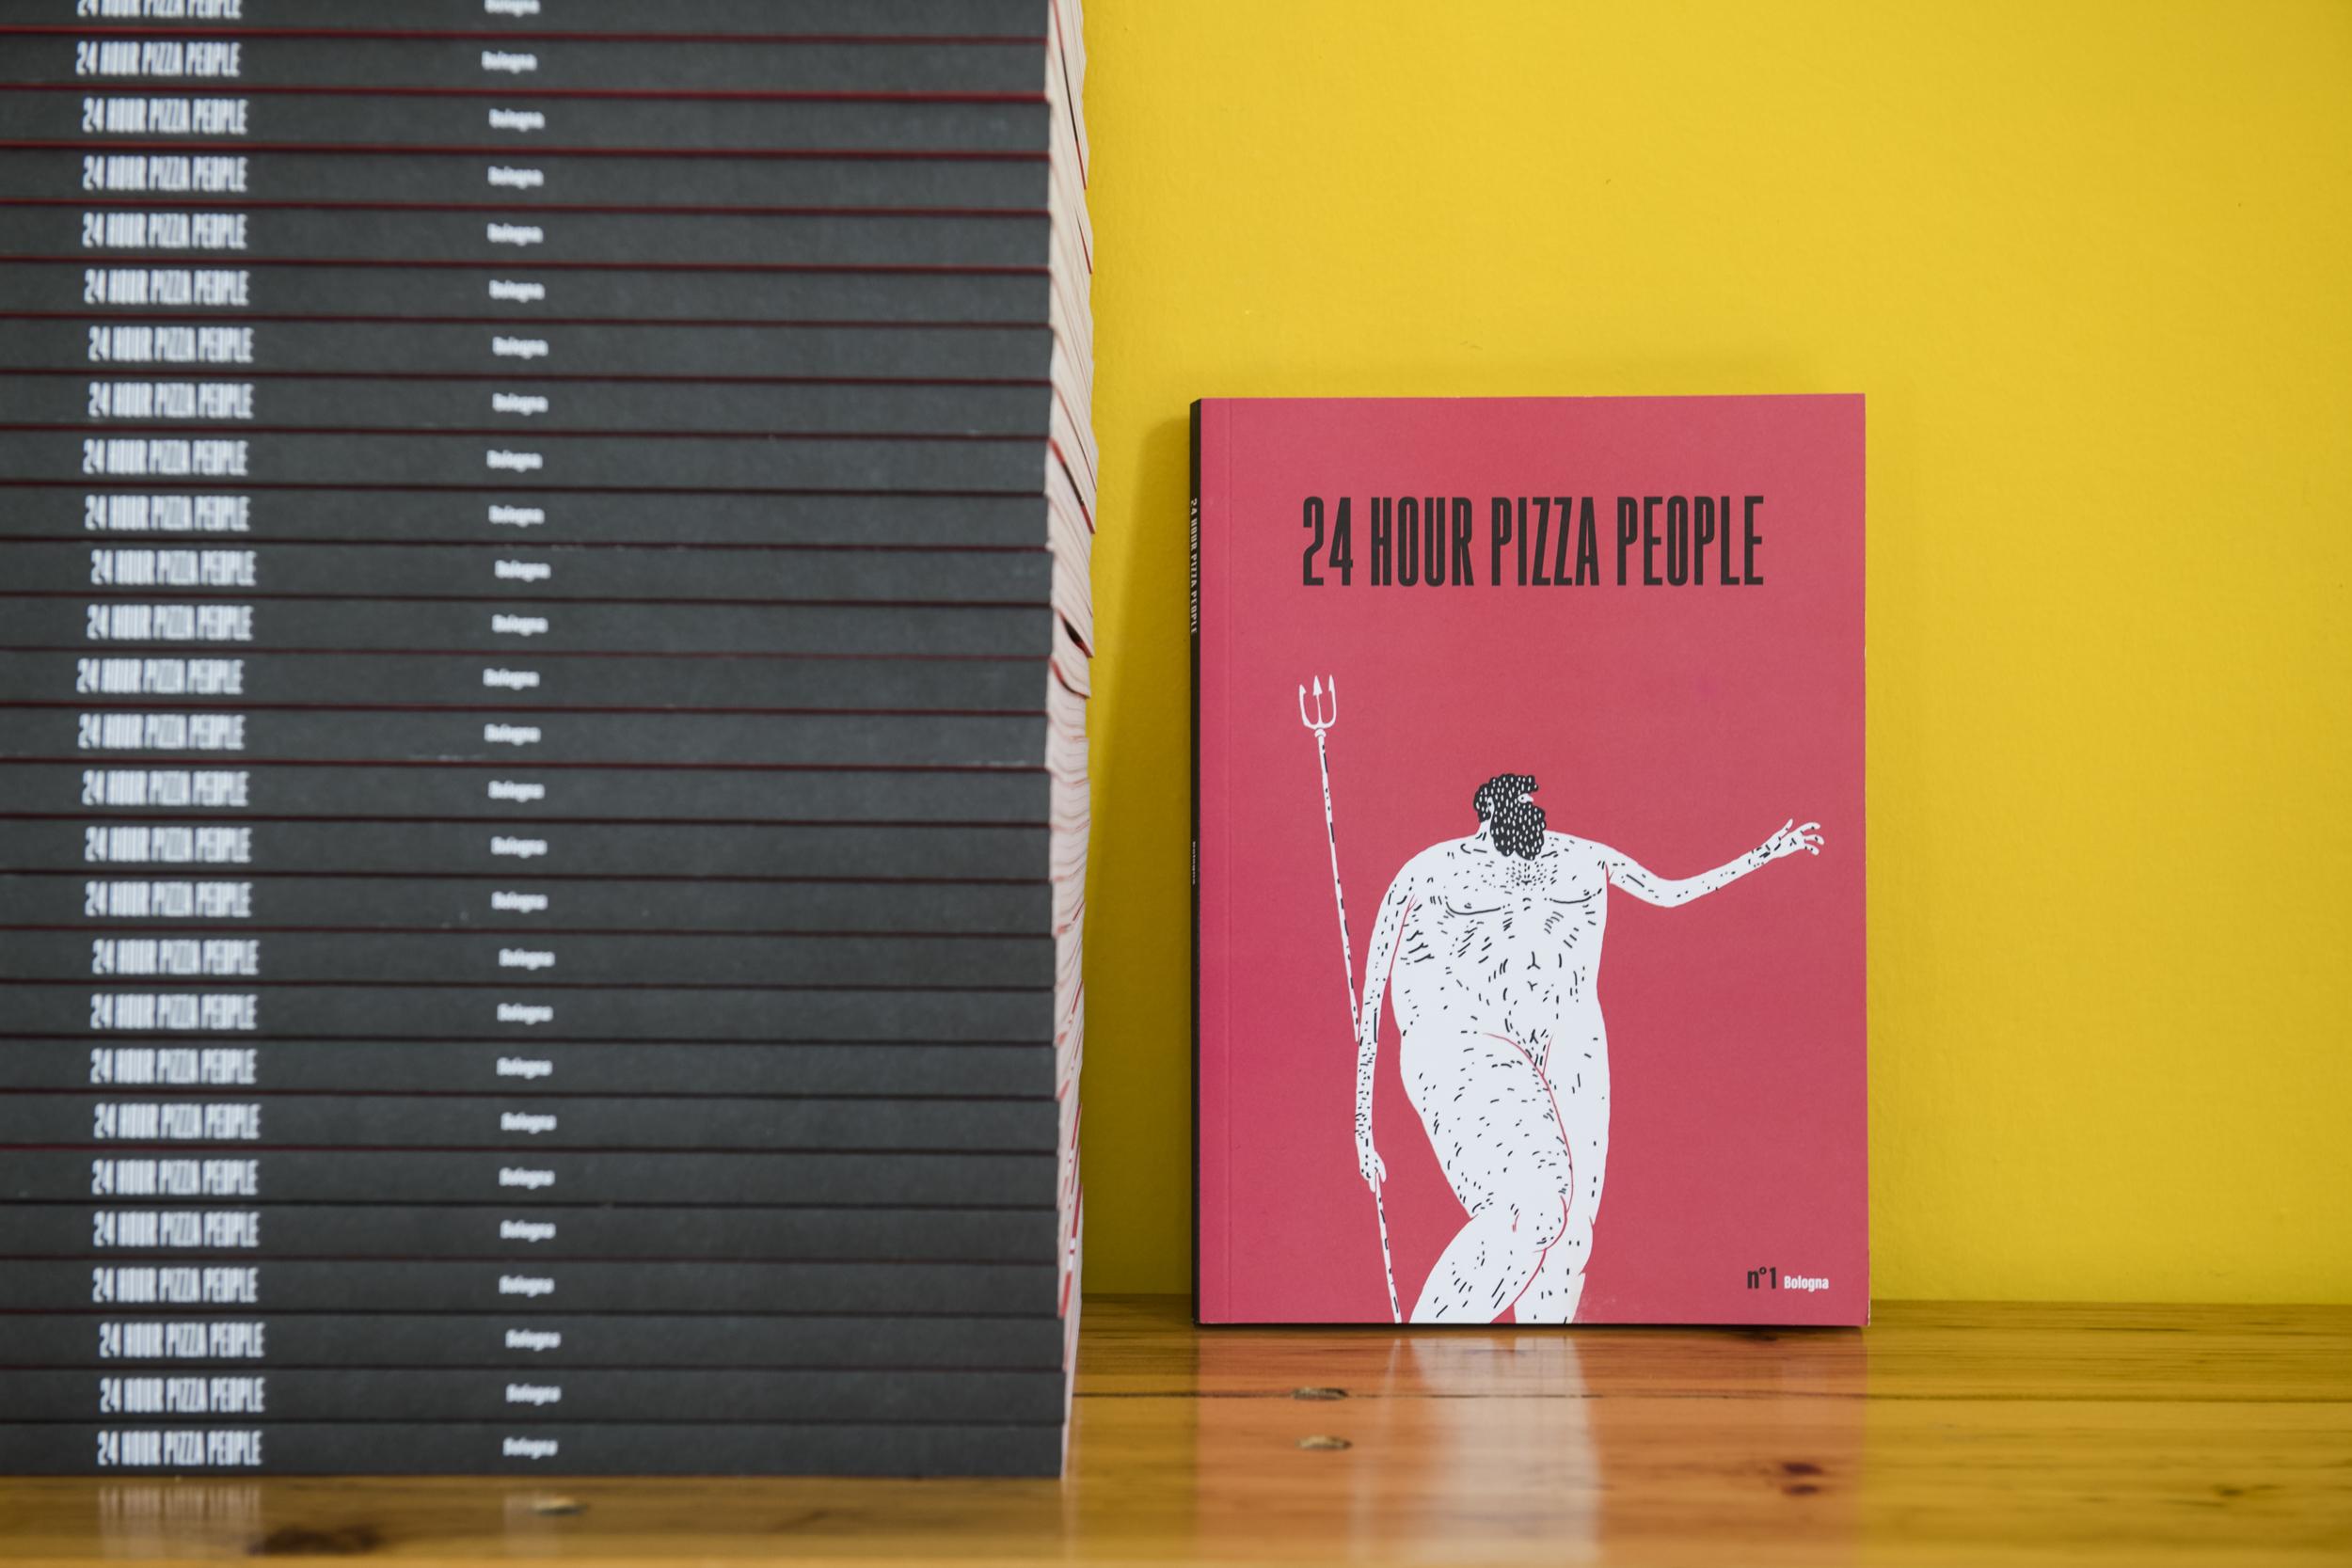 24 HOUR PIZZA PEOPLE - MAGAZINE